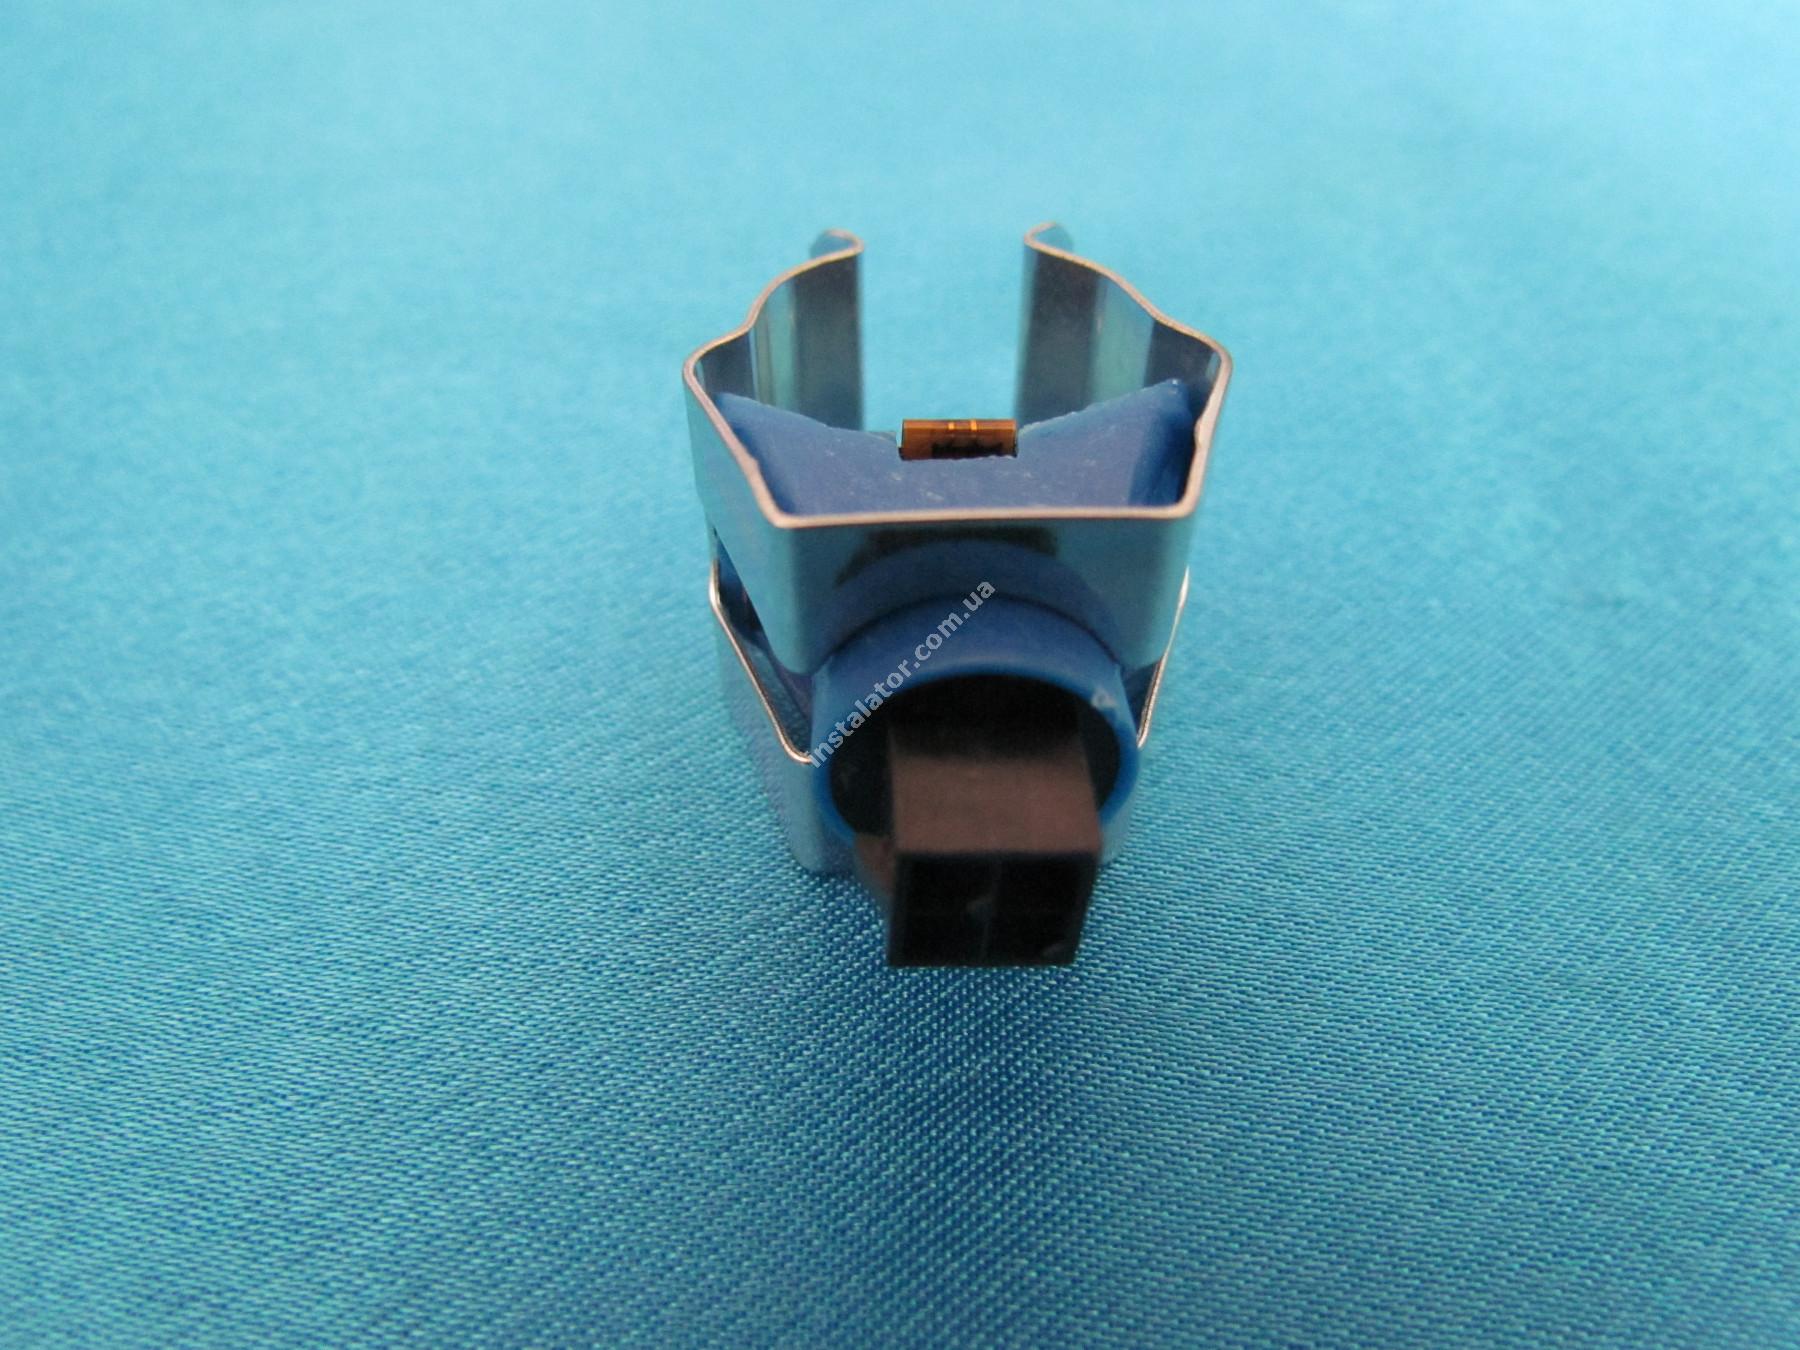 39819550 Датчик температури NTC (термостат) Ferroli DOMIproject, DOMItech,DIVATOP full-image-2